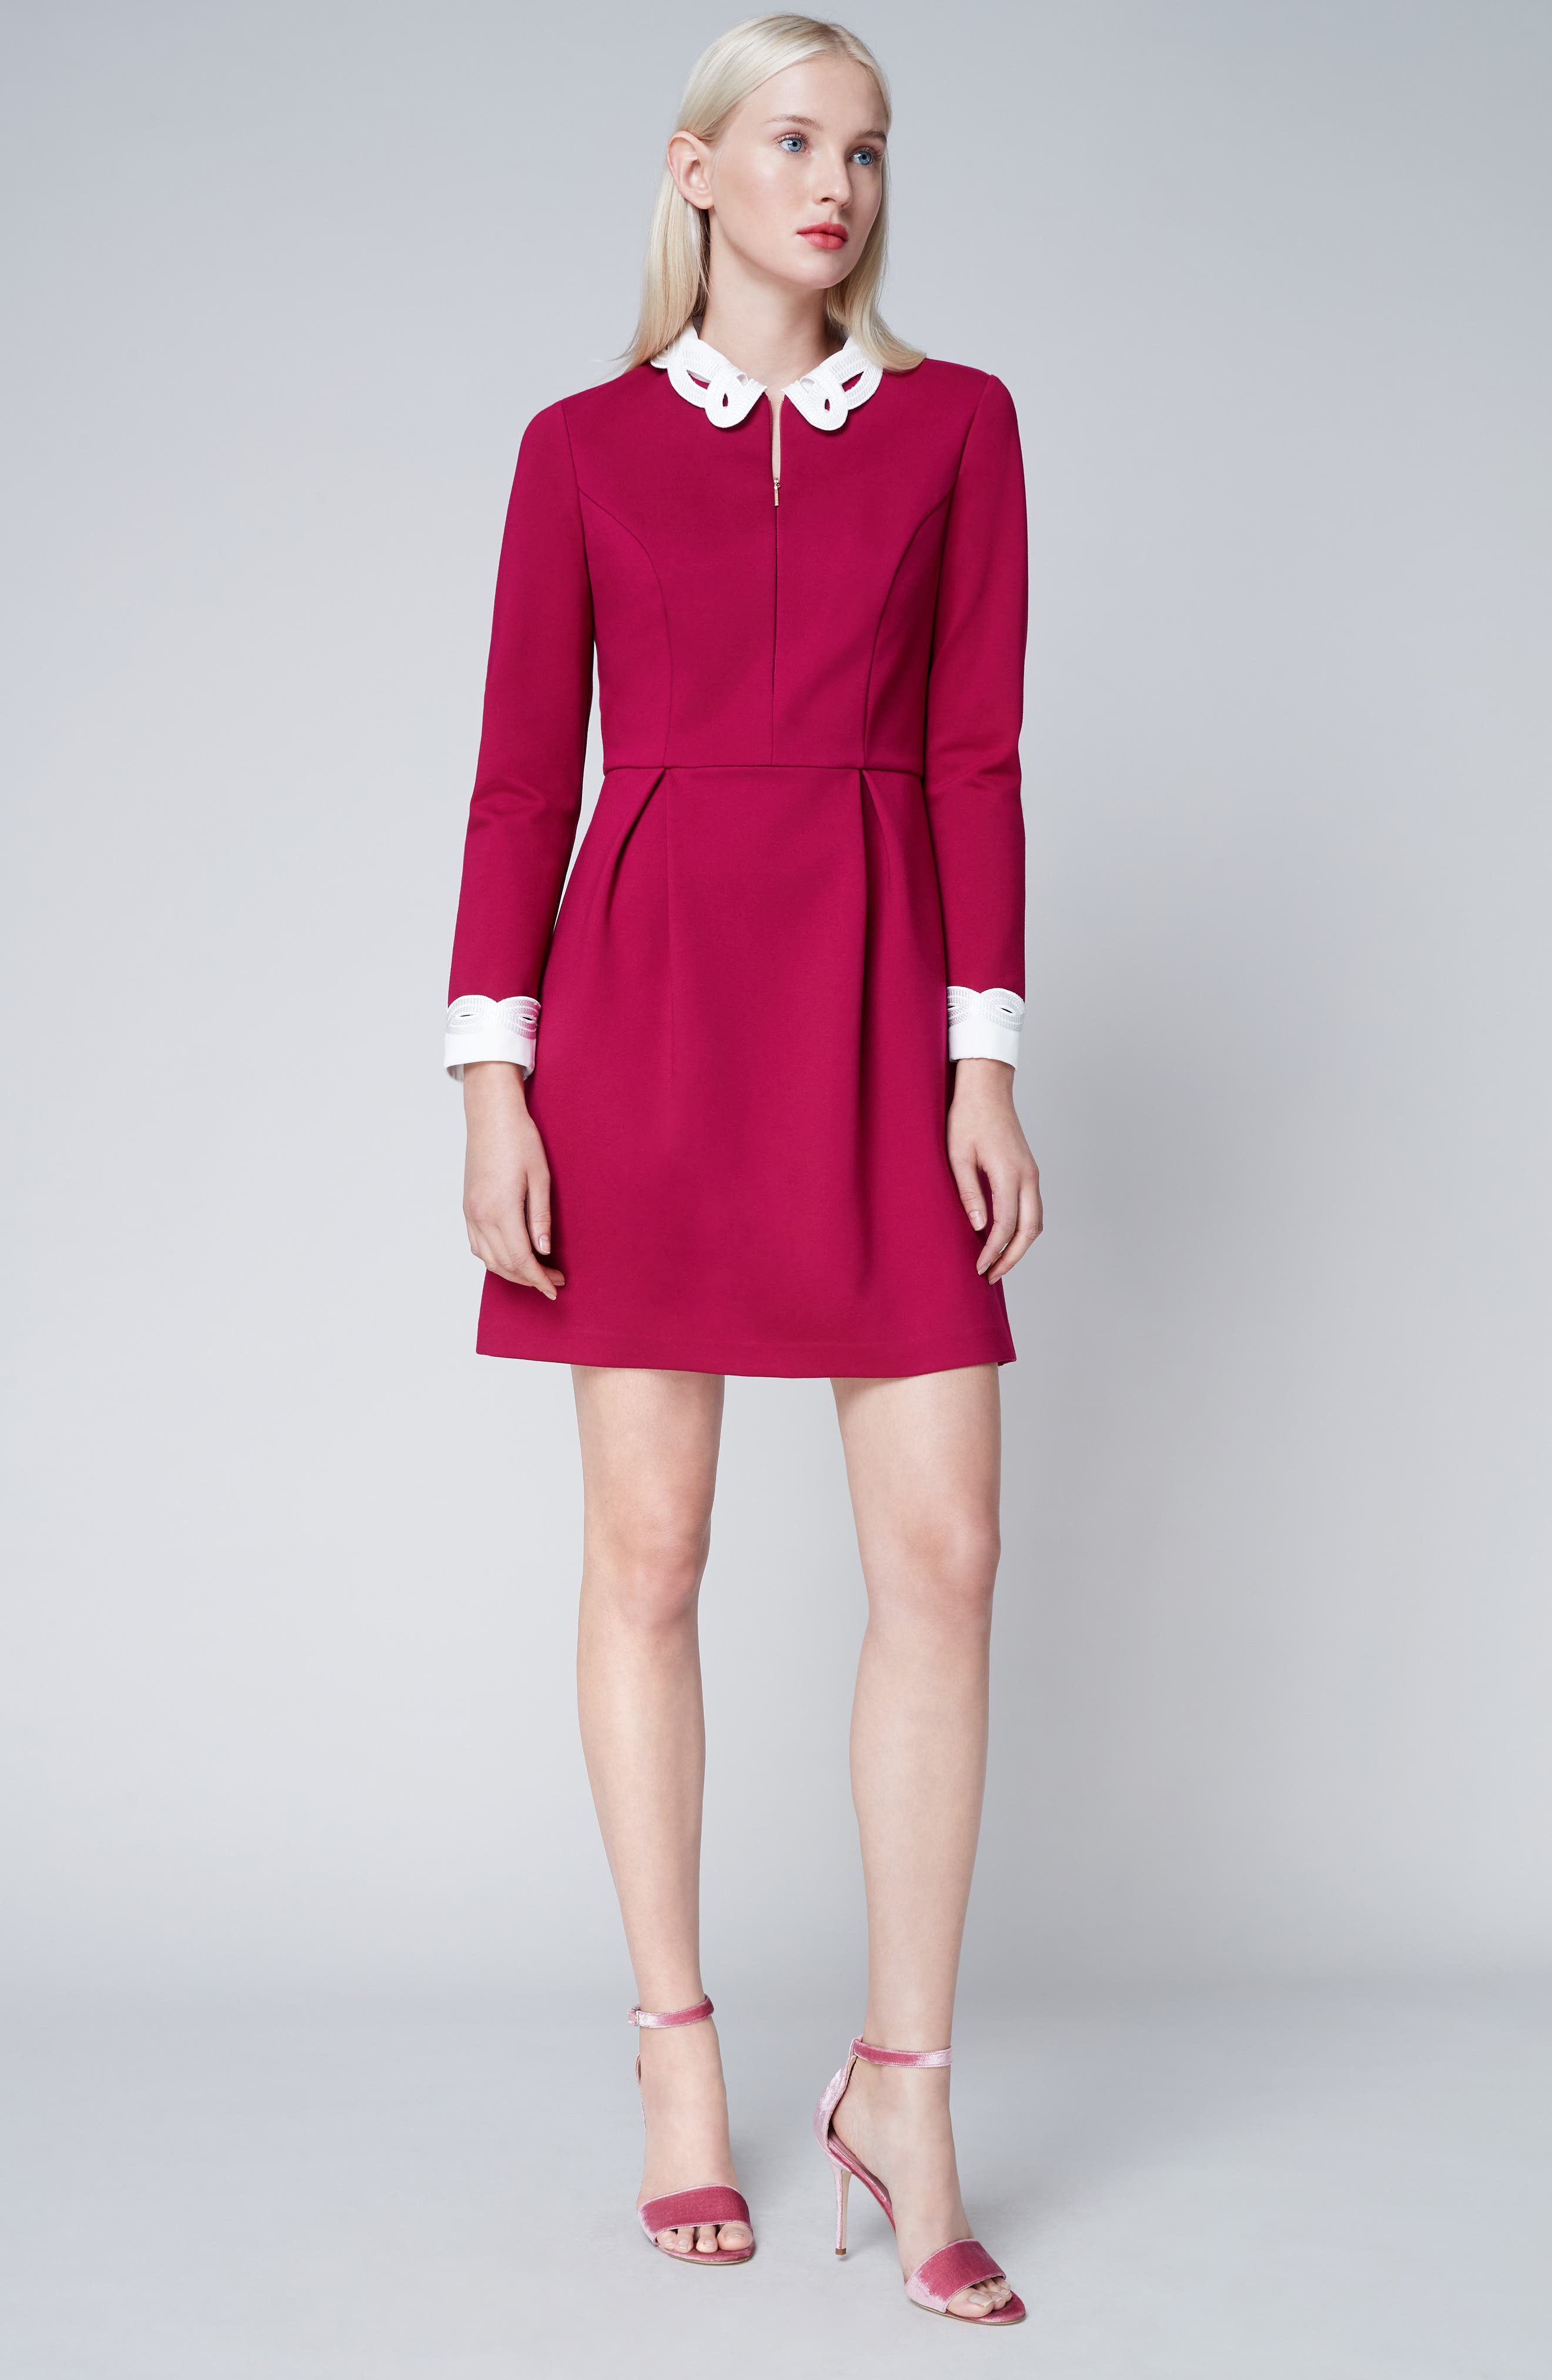 Shealah Embroidered Trim A-Line Dress,                             Alternate thumbnail 7, color,                             651